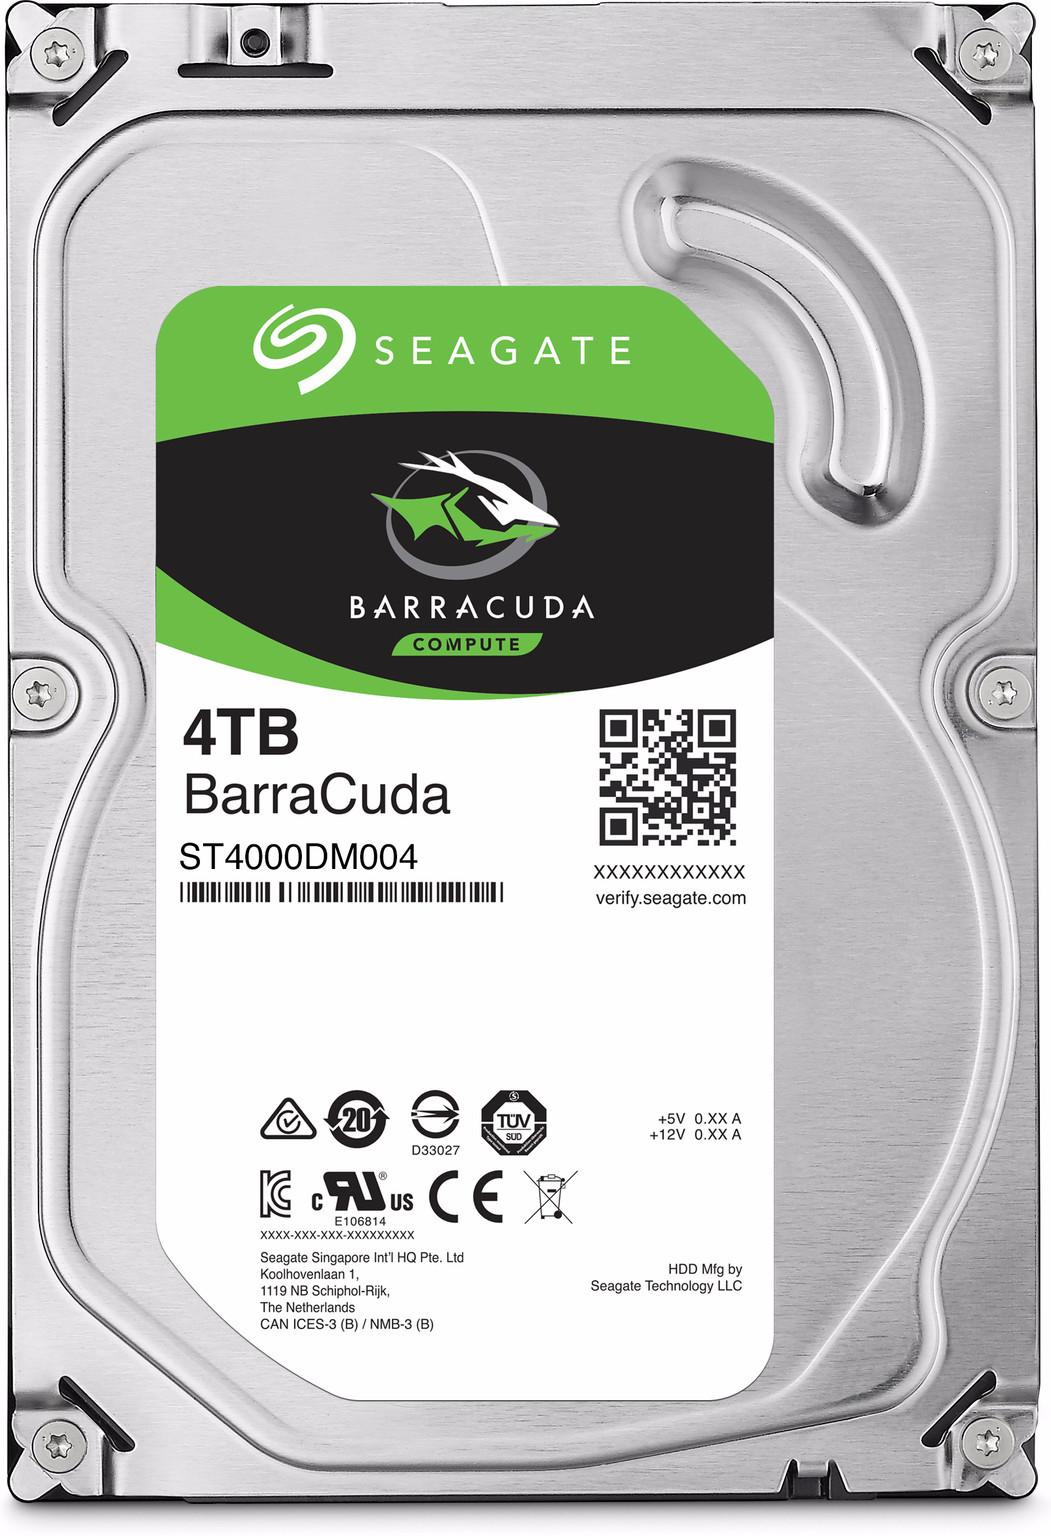 "4TB Seagate BarraCuda 3.5"" 5400RPM SATA HDD image"